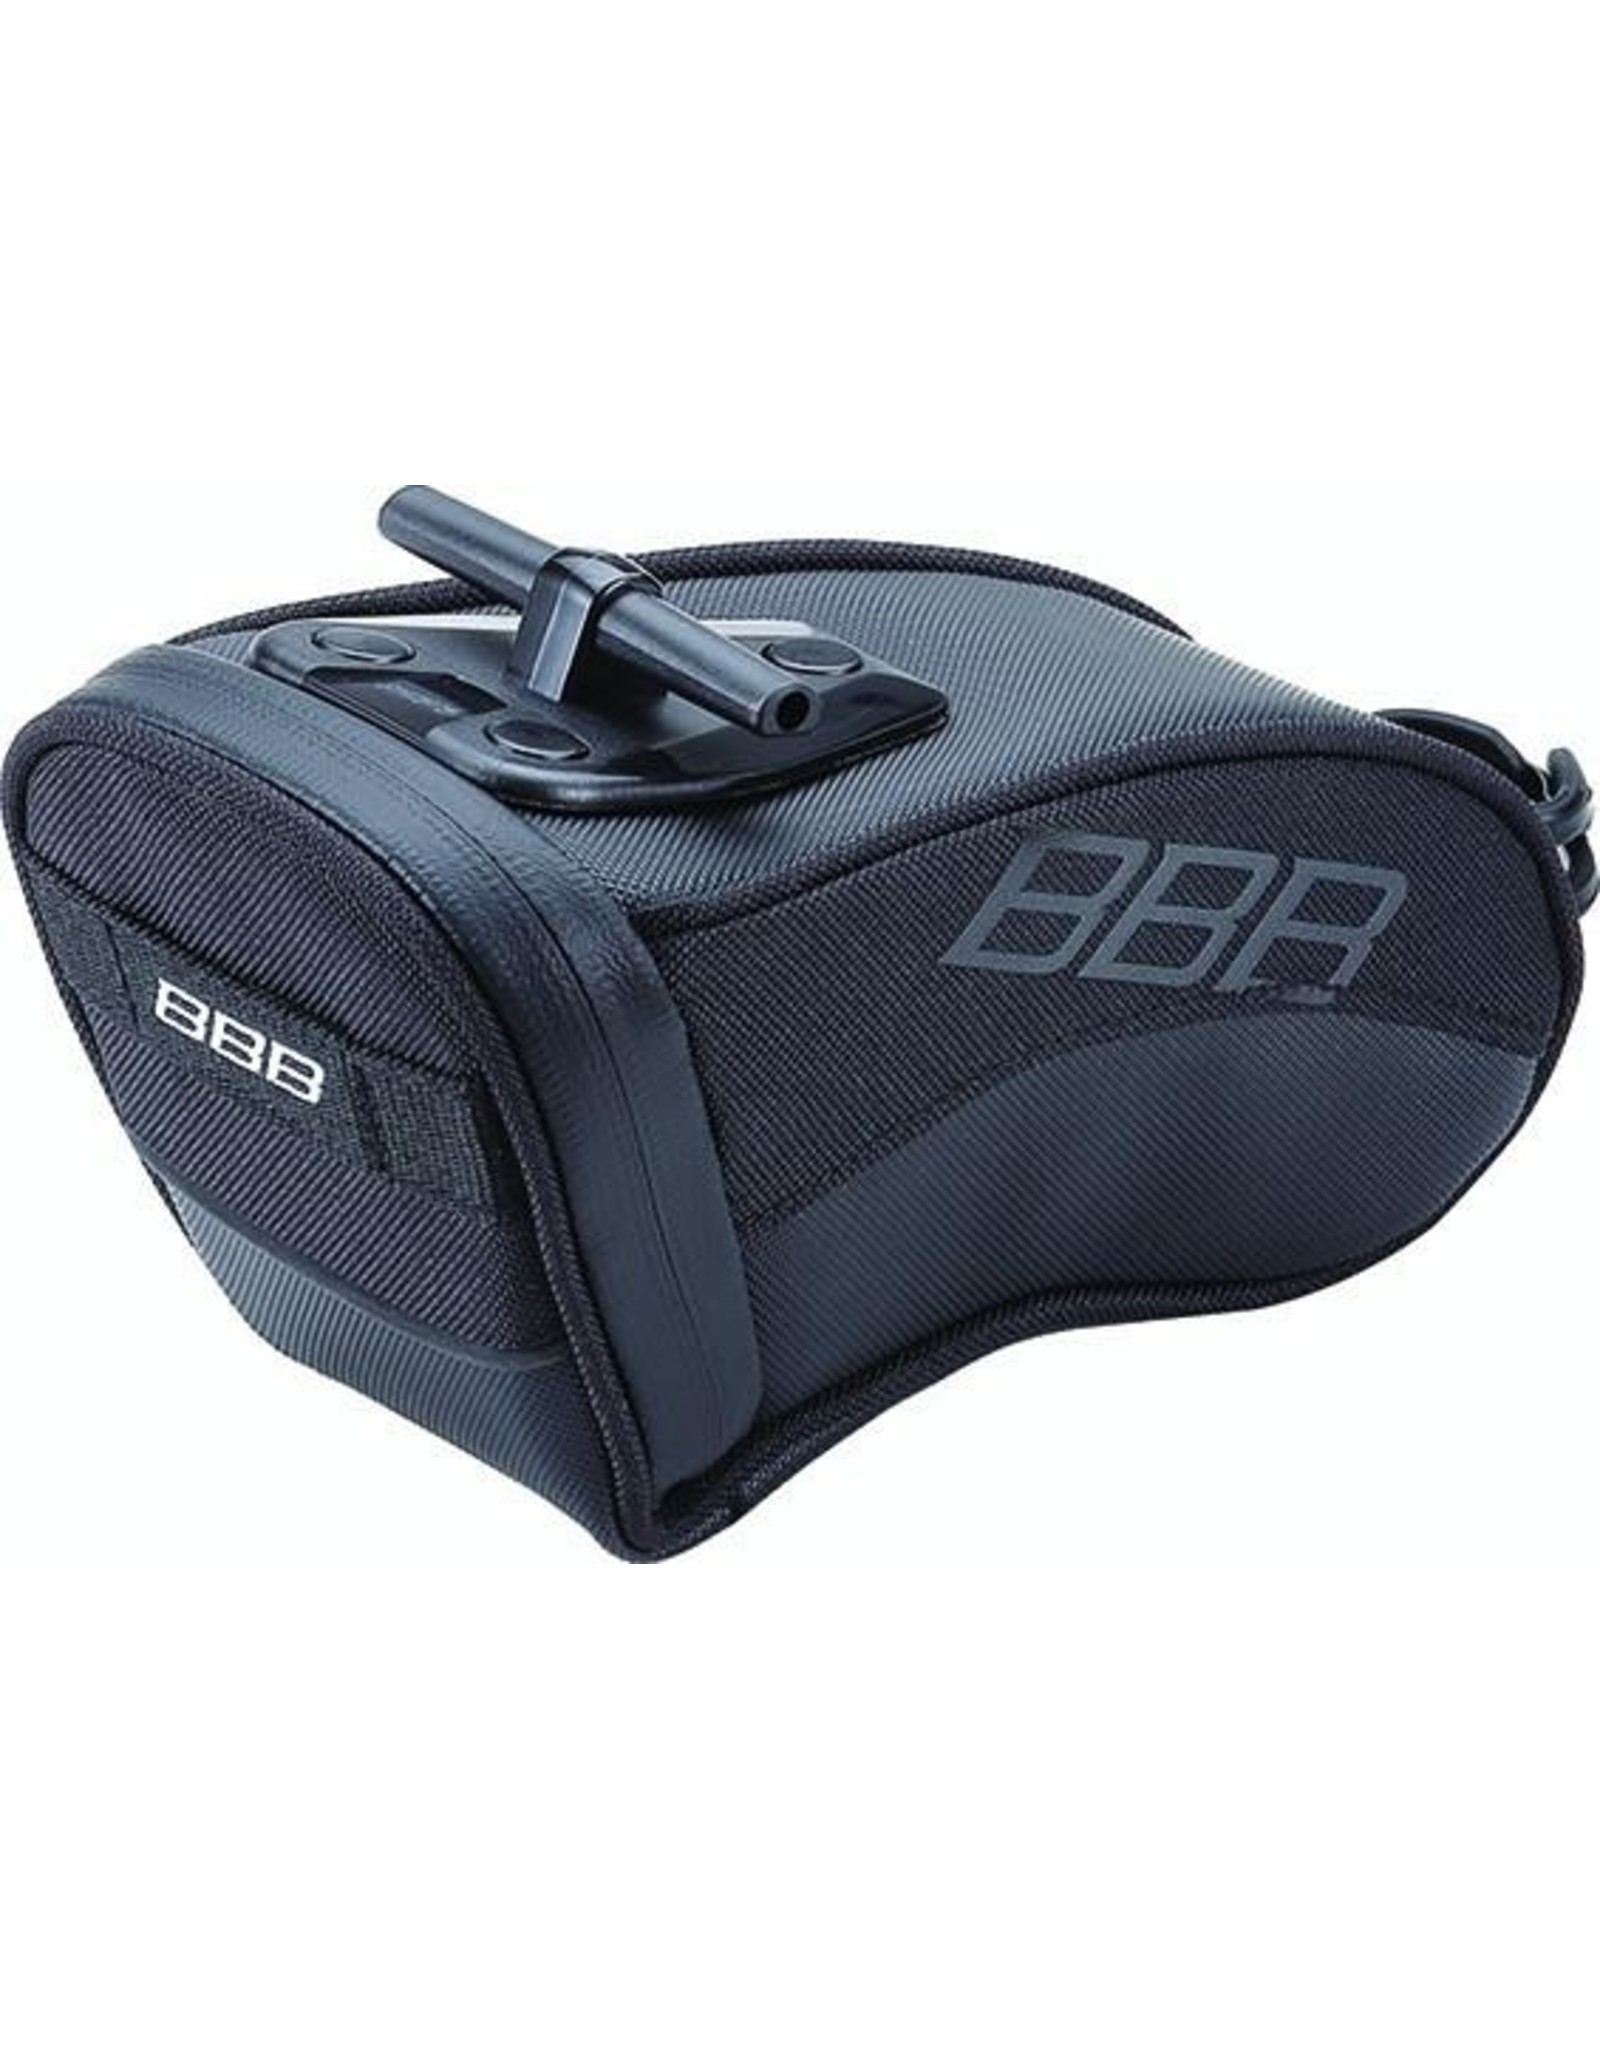 BBB CRD-BSB-13 - CurvePack Saddle Bag (S)